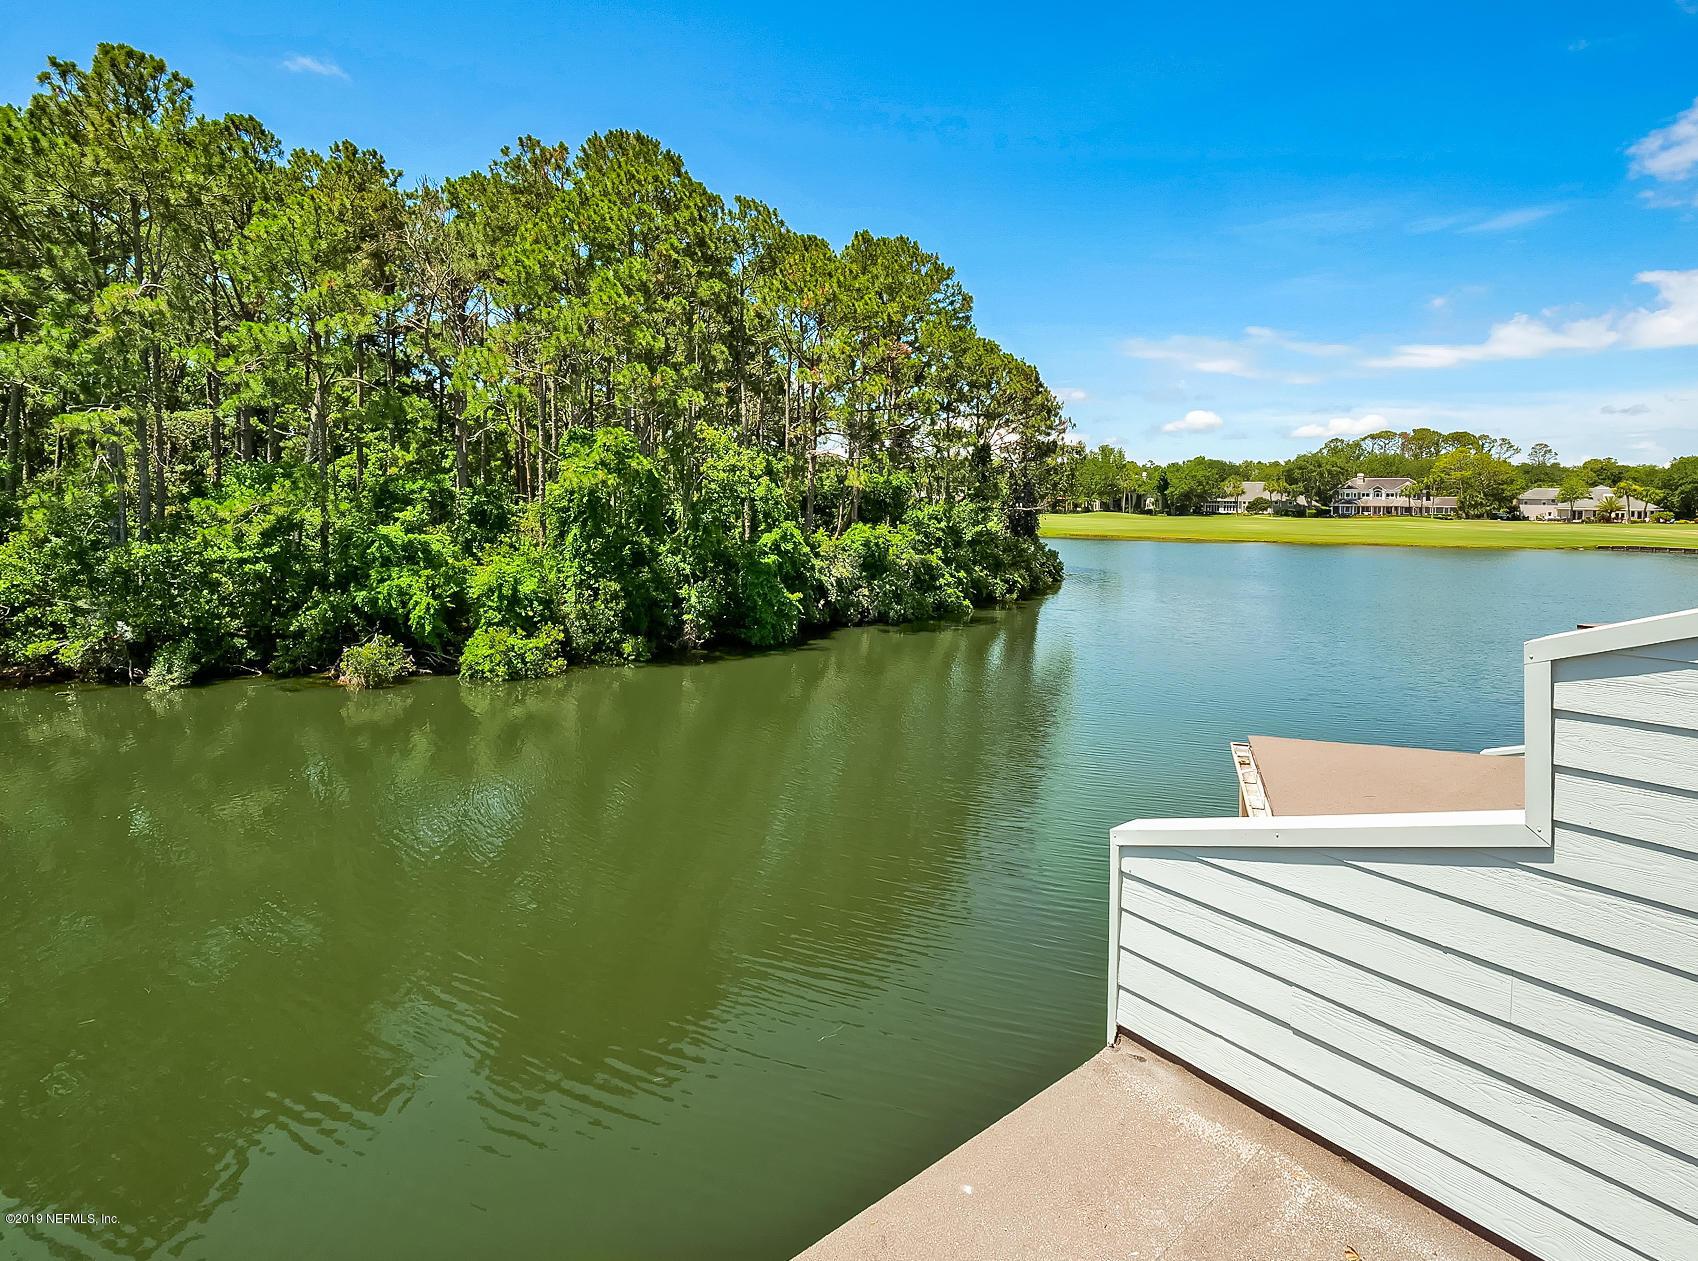 25 LITTLE BAY HARBOR, PONTE VEDRA BEACH, FLORIDA 32082, 3 Bedrooms Bedrooms, ,3 BathroomsBathrooms,Condo,For sale,LITTLE BAY HARBOR,1001499